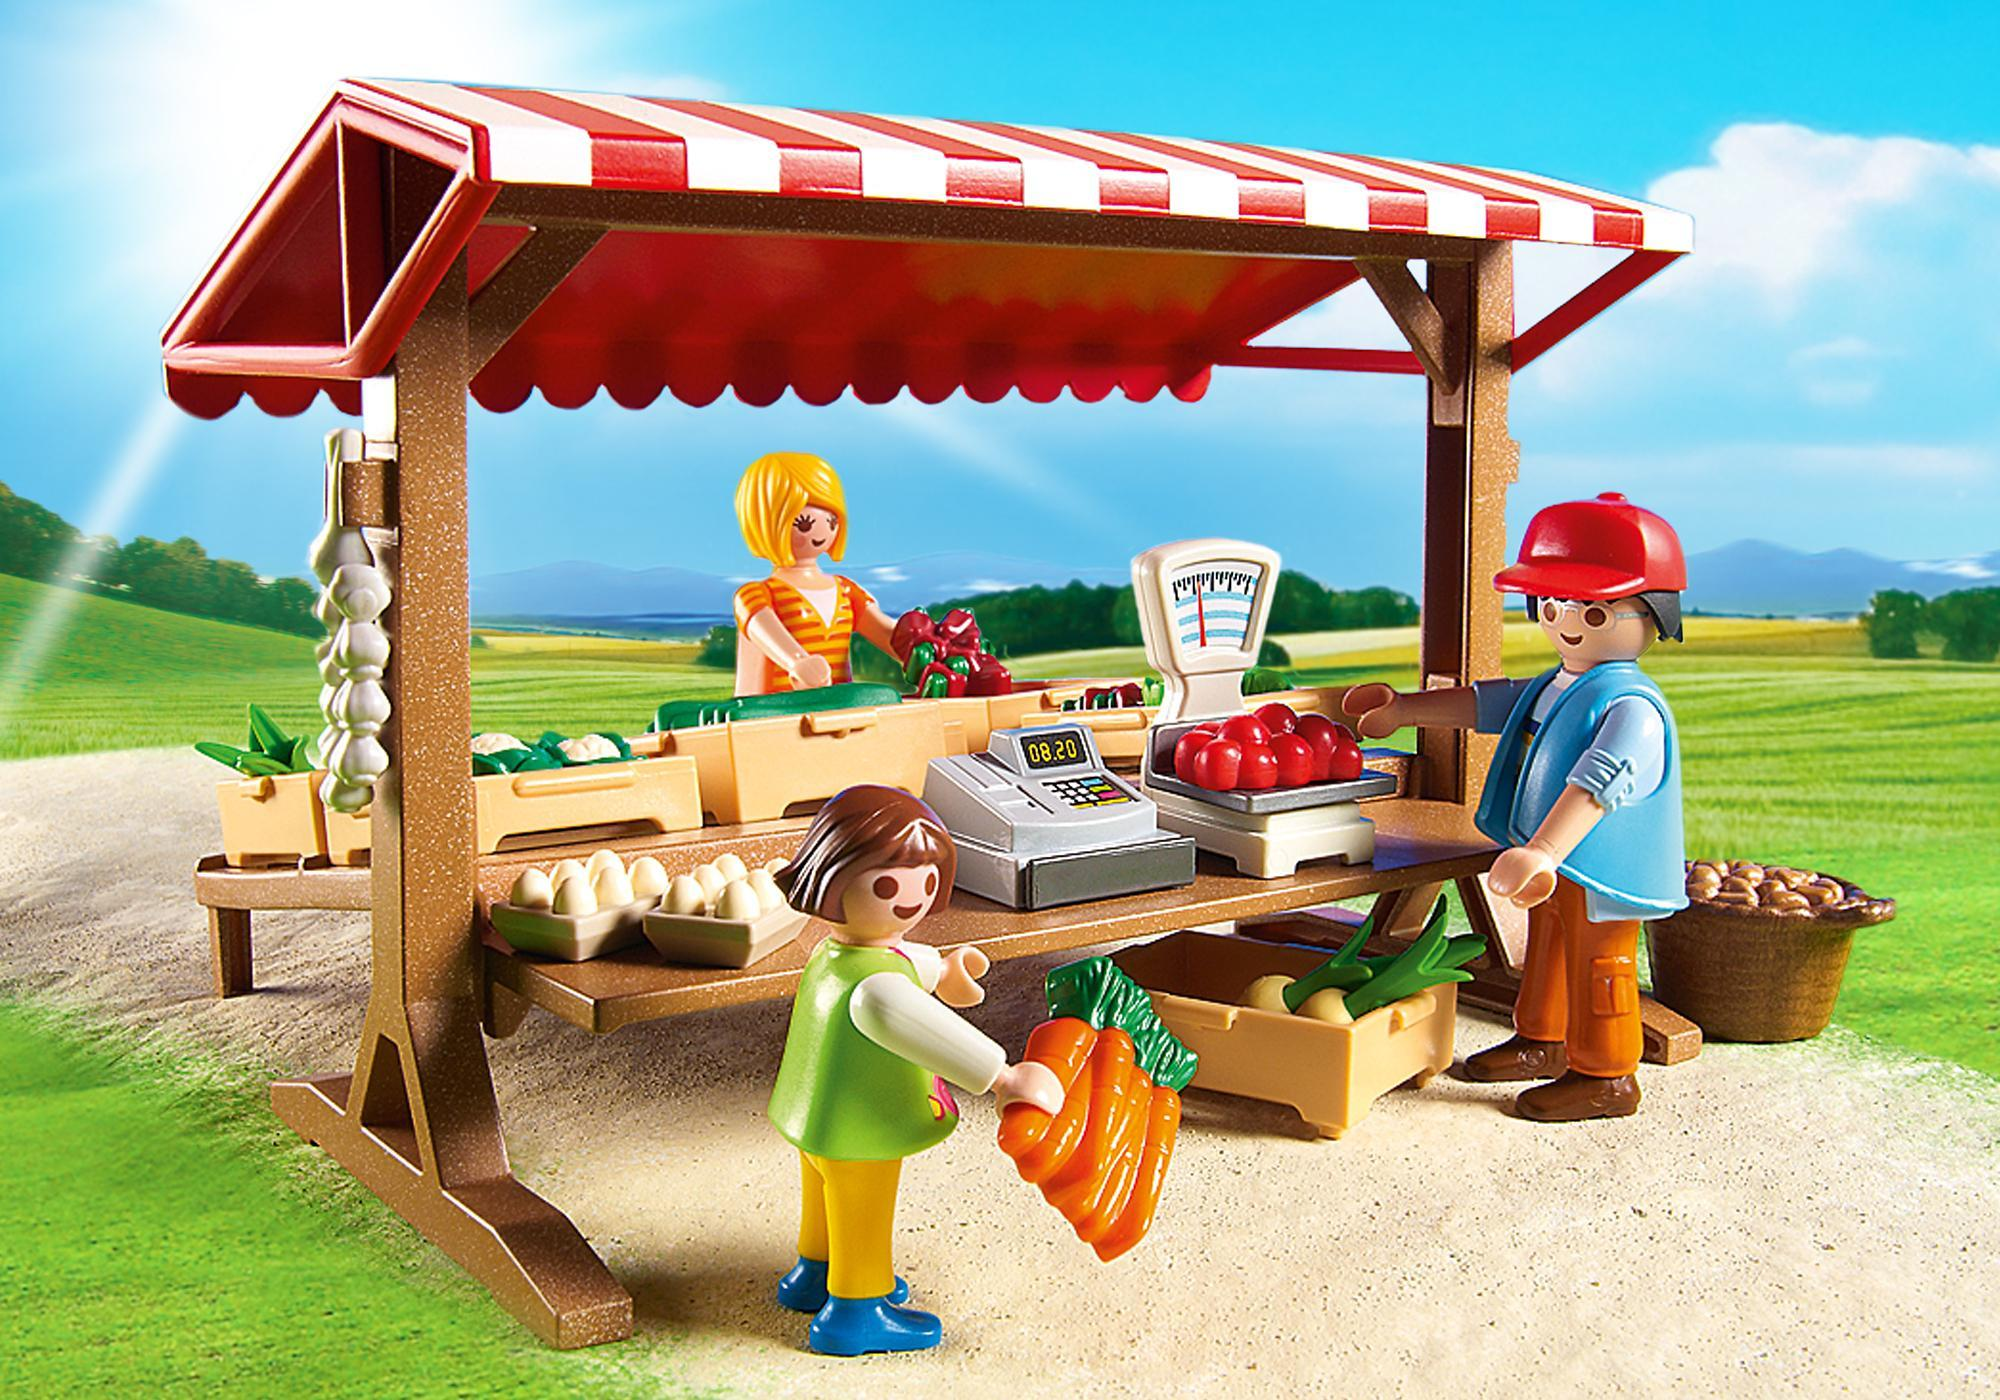 http://media.playmobil.com/i/playmobil/6121_product_extra1/Farmer's Market